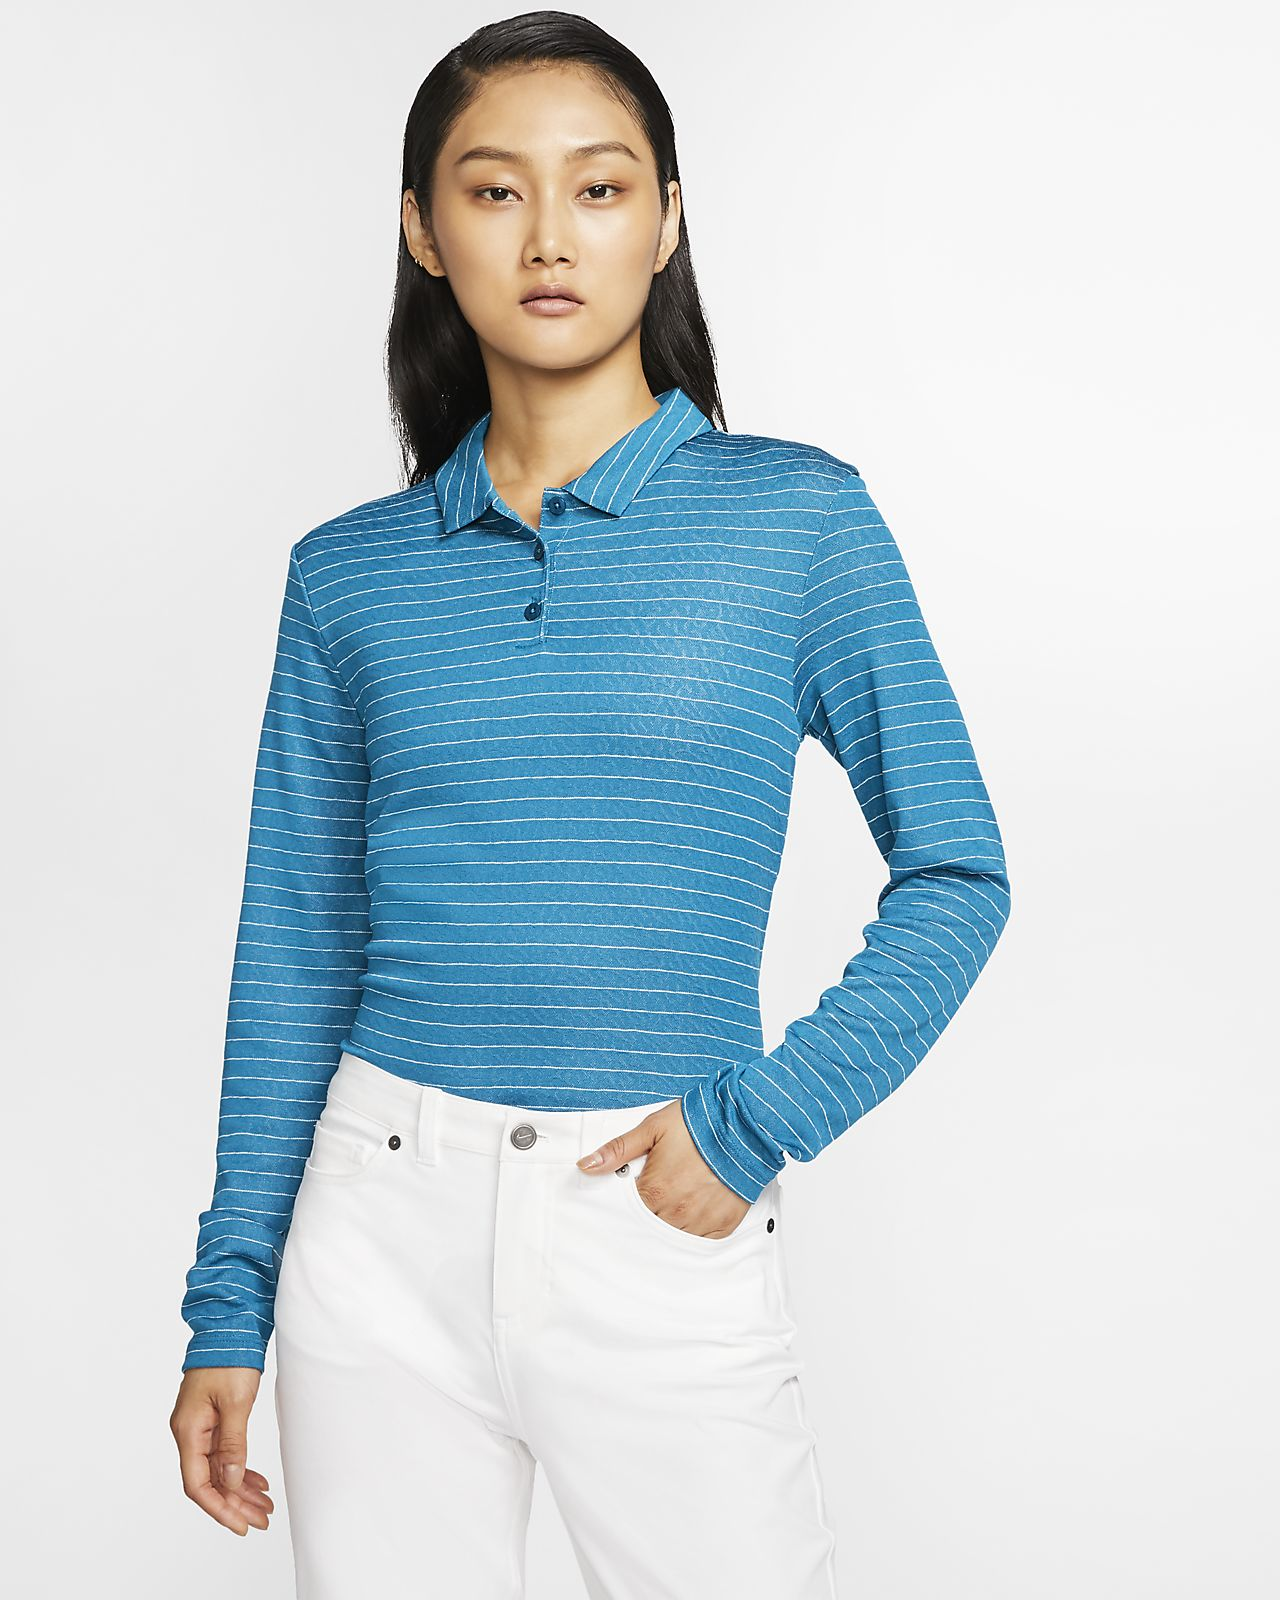 Nike Dri-FIT Women's Long-Sleeve Golf Polo